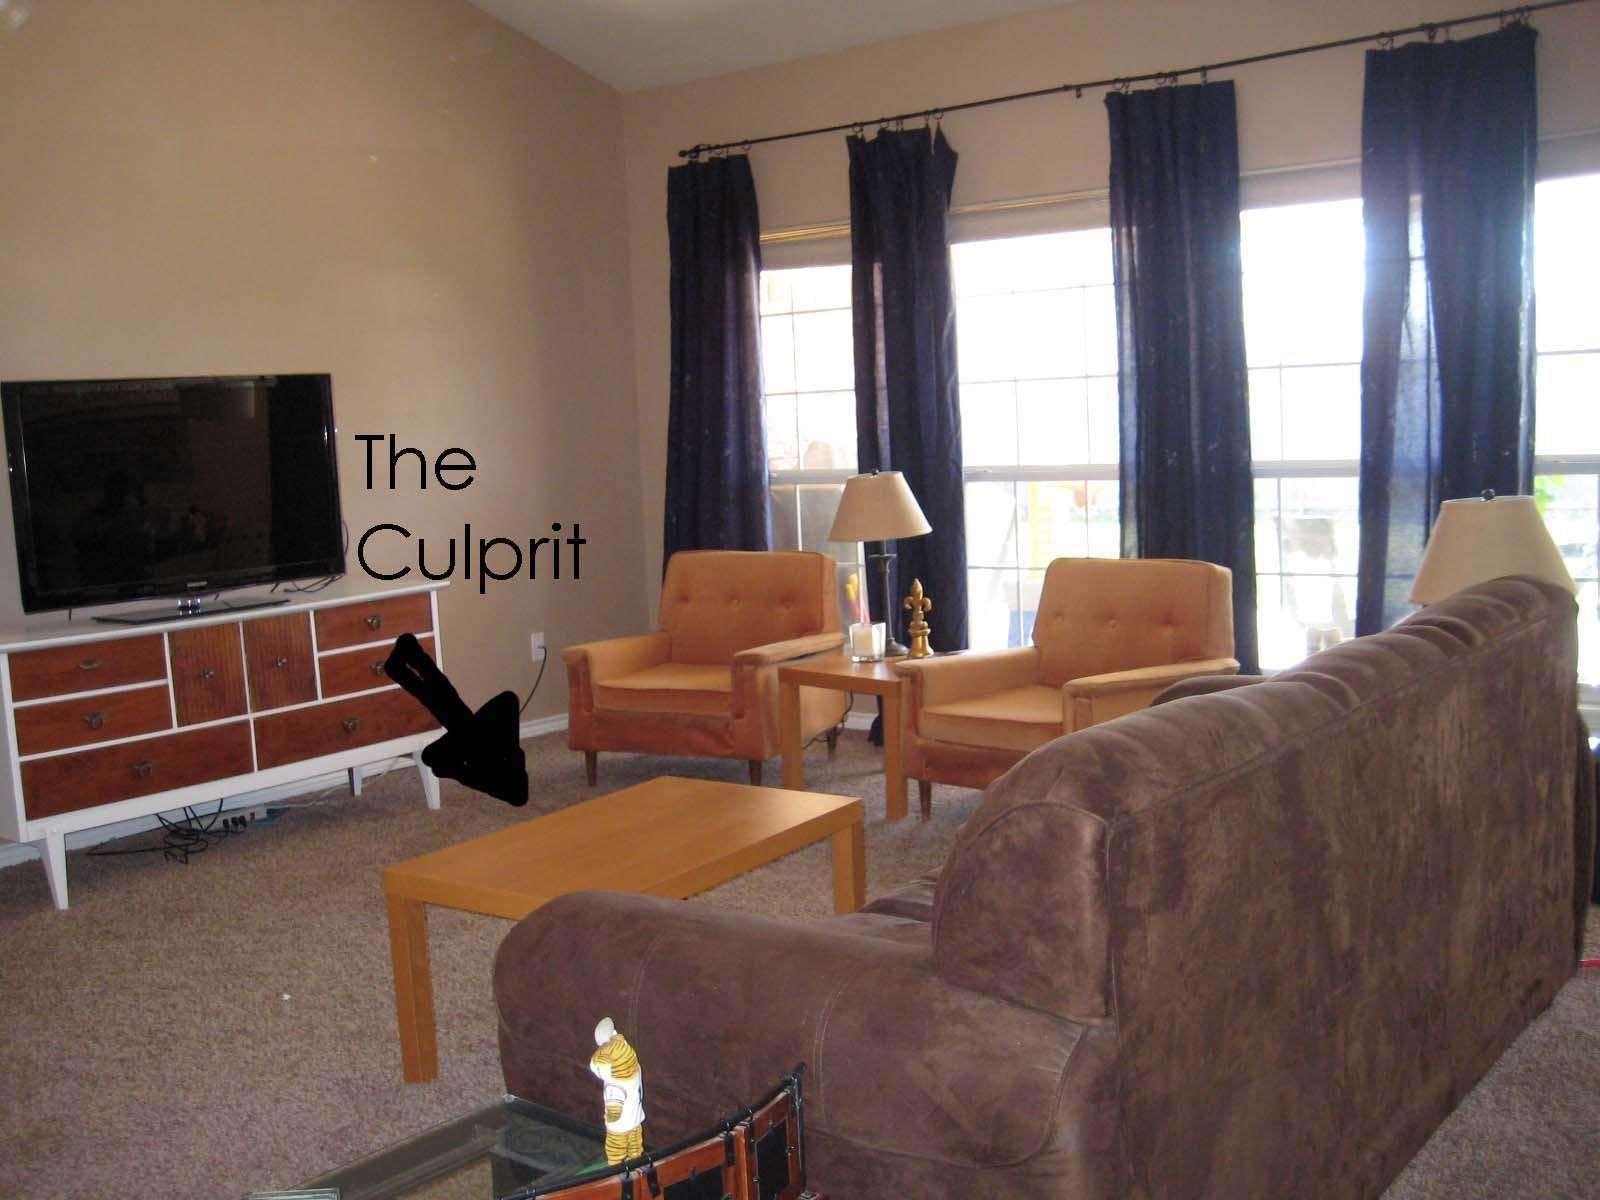 Excellent Picture Of Apartment Decorating College Living Room Amazing Decorations